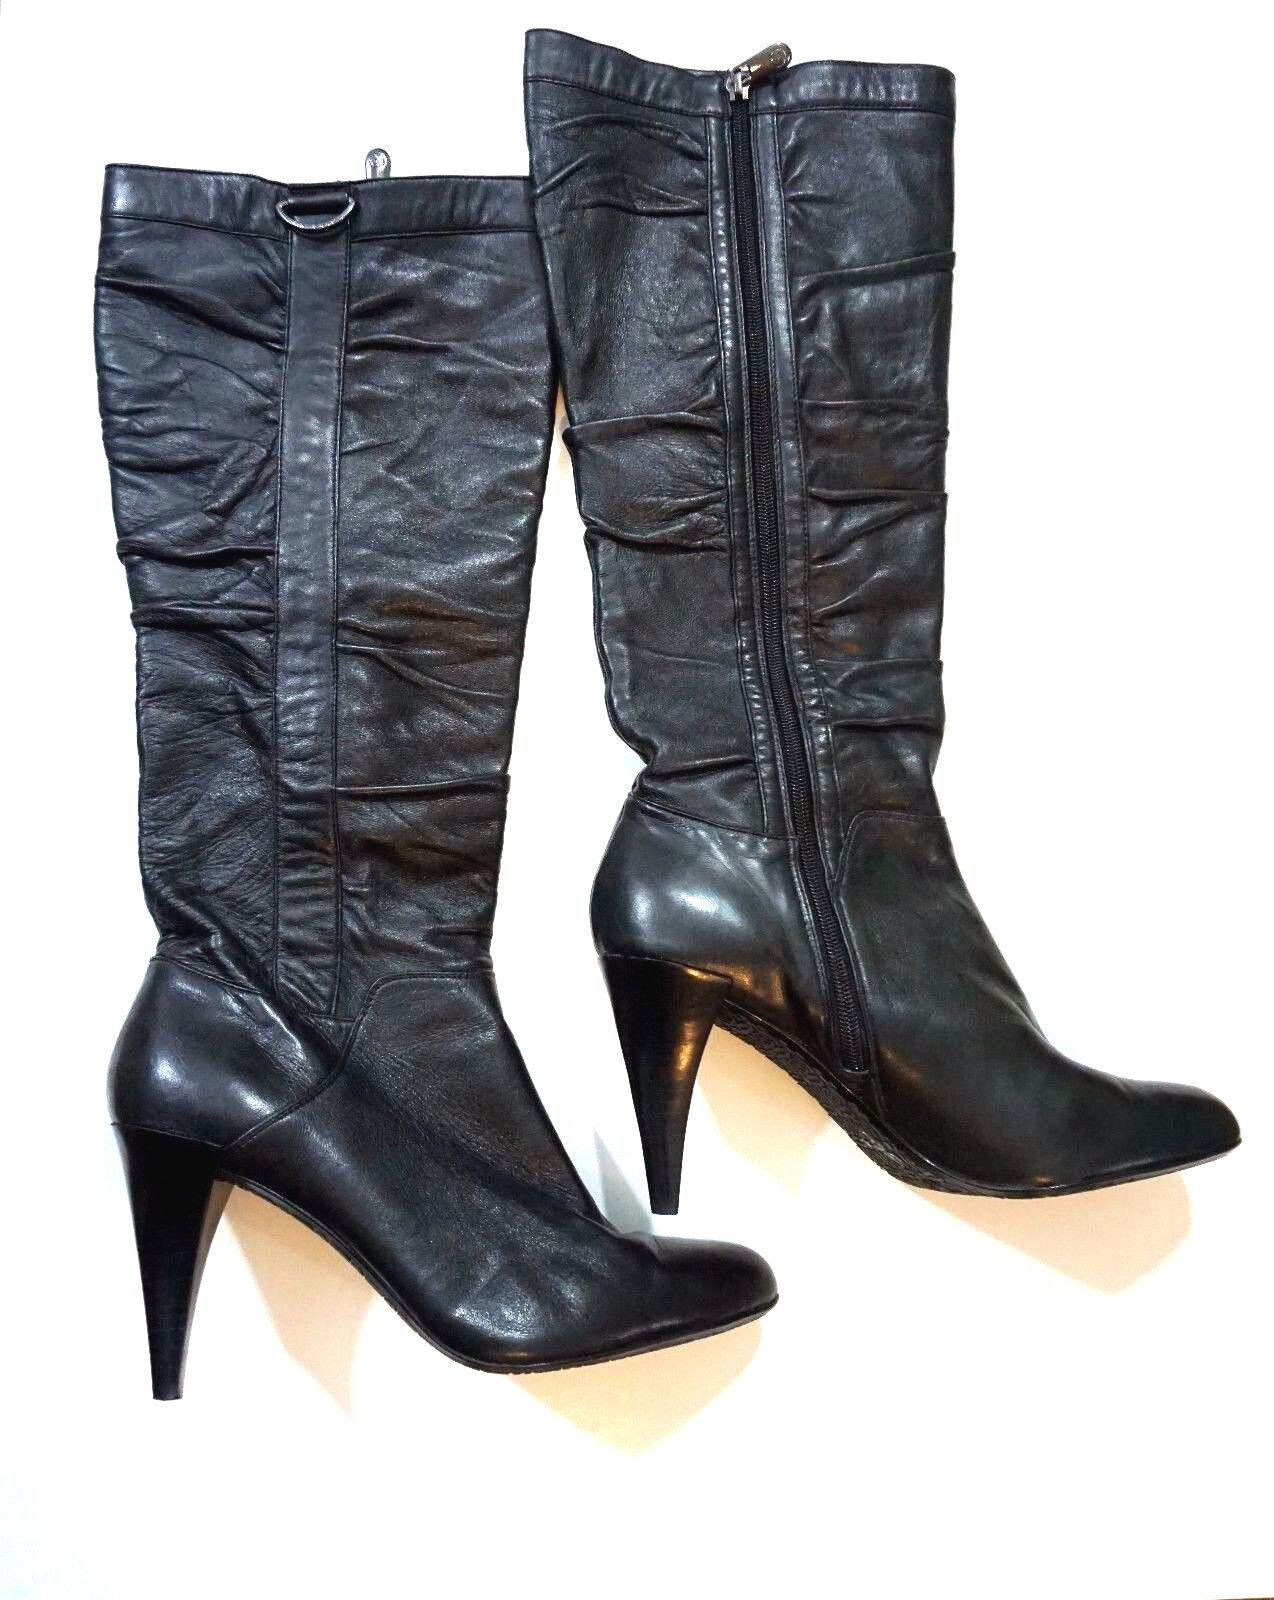 Adrienne Vittadini Sunny bottes femme bottes cuir noir 9.5